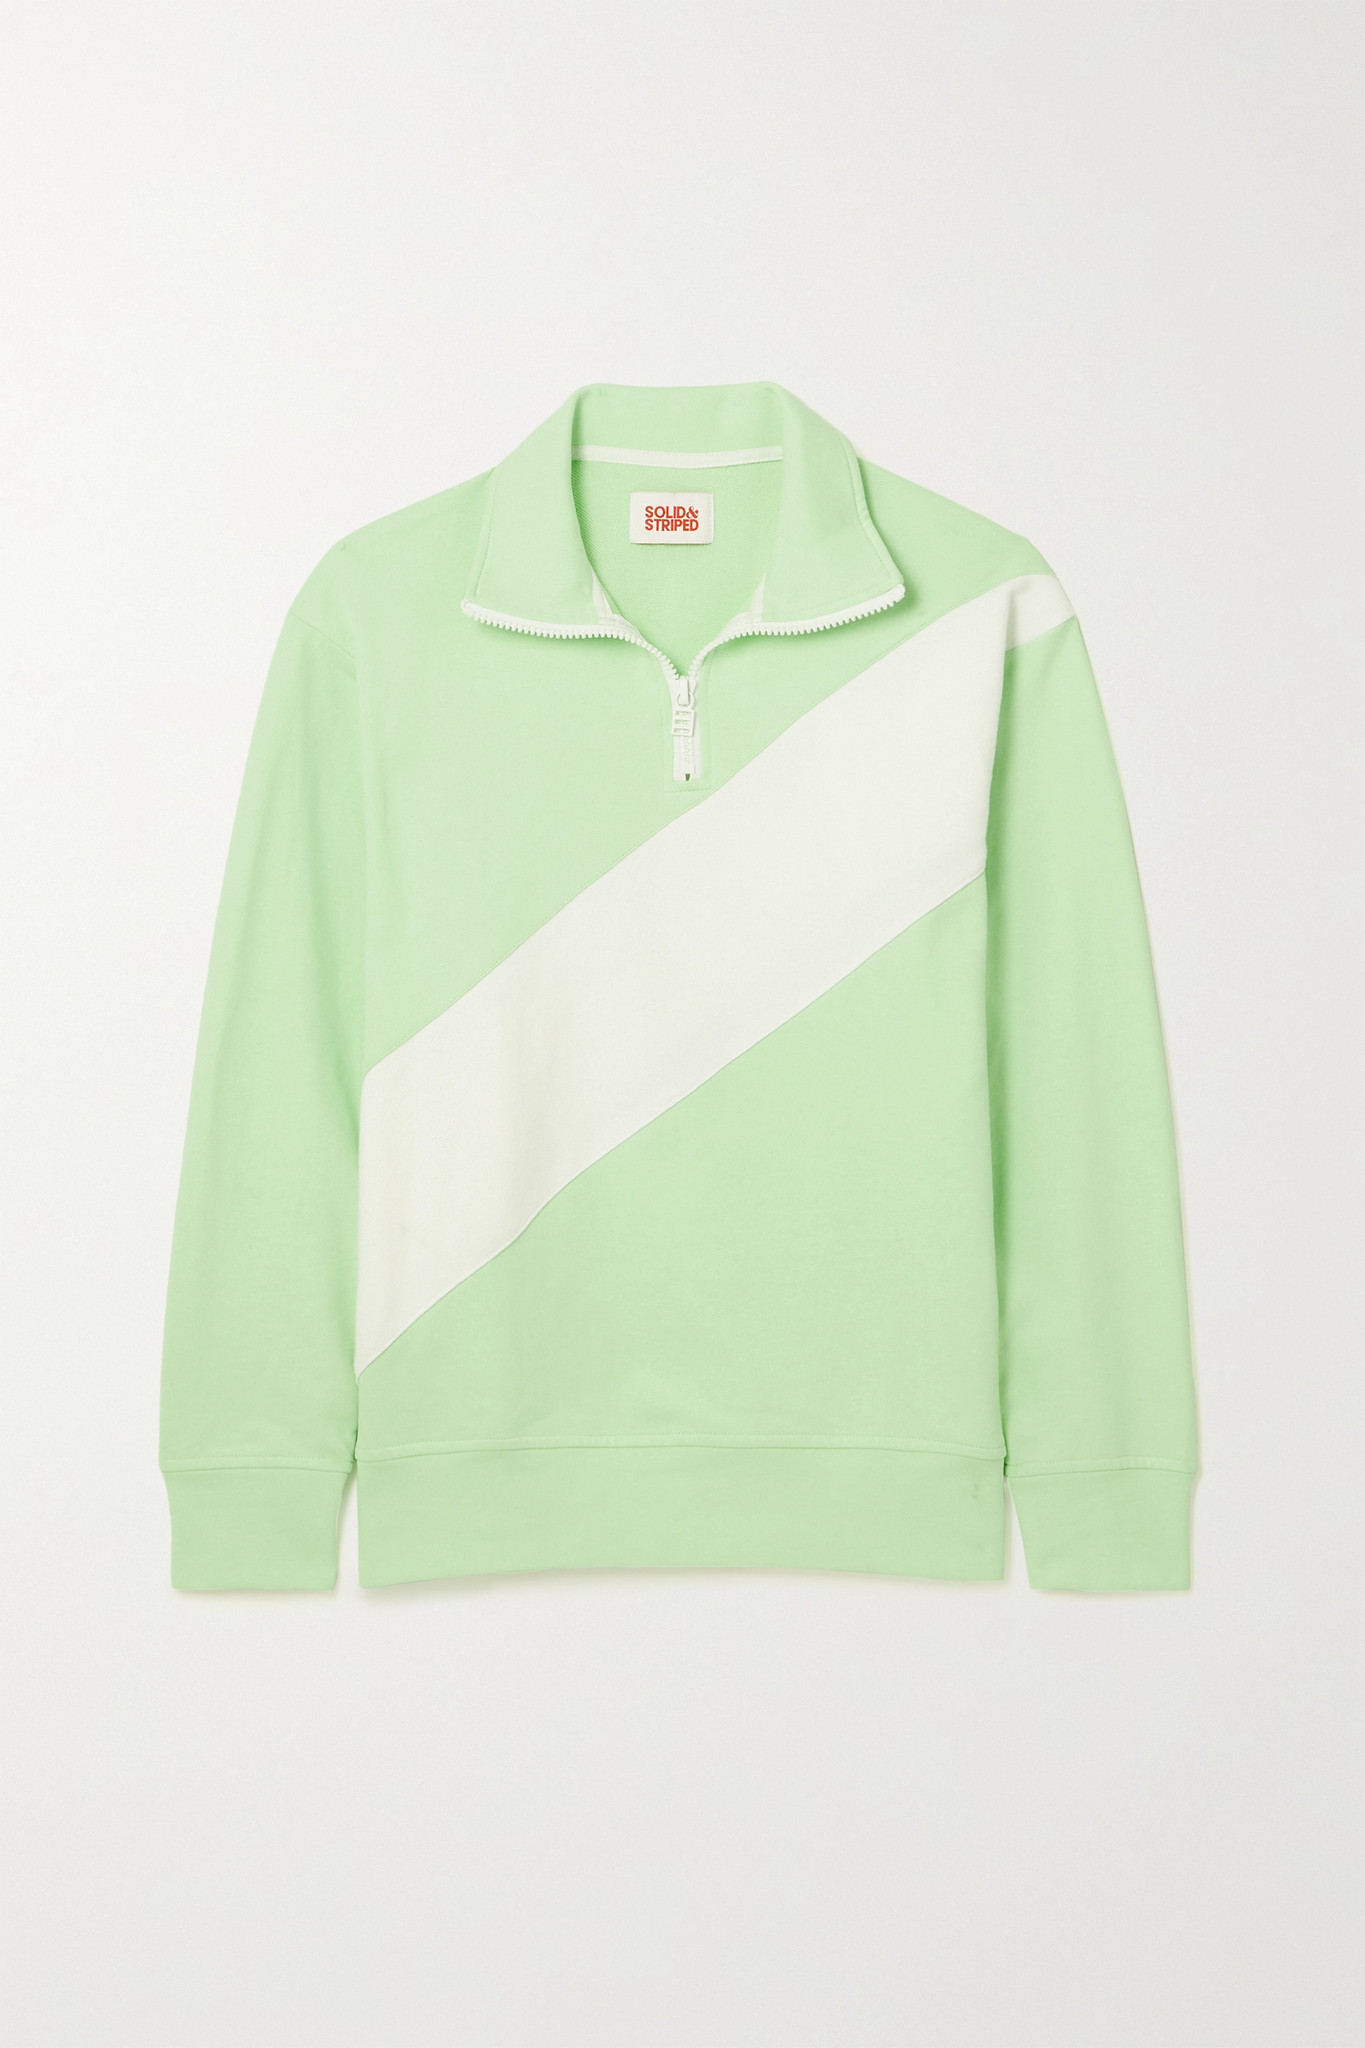 SOLID & STRIPED - The Pullover 双色棉质混纺毛巾布卫衣 - 绿色 - x large